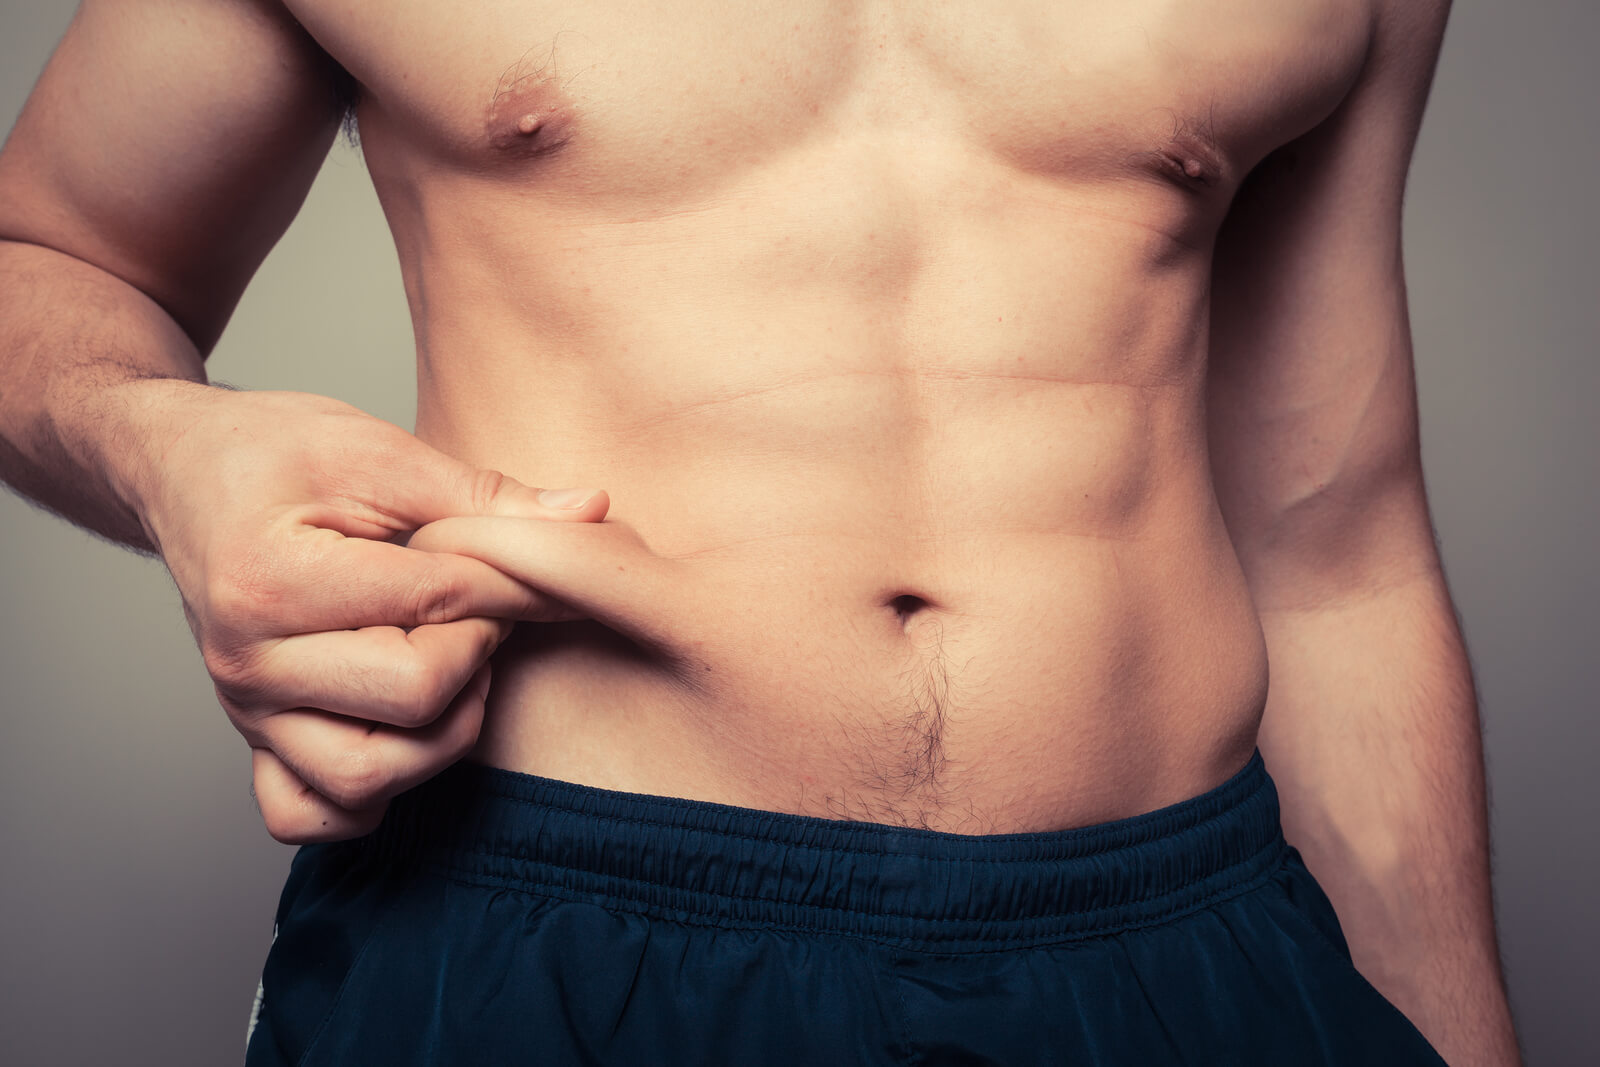 Smart Liposuction: An Innovative Fat Removal Technique